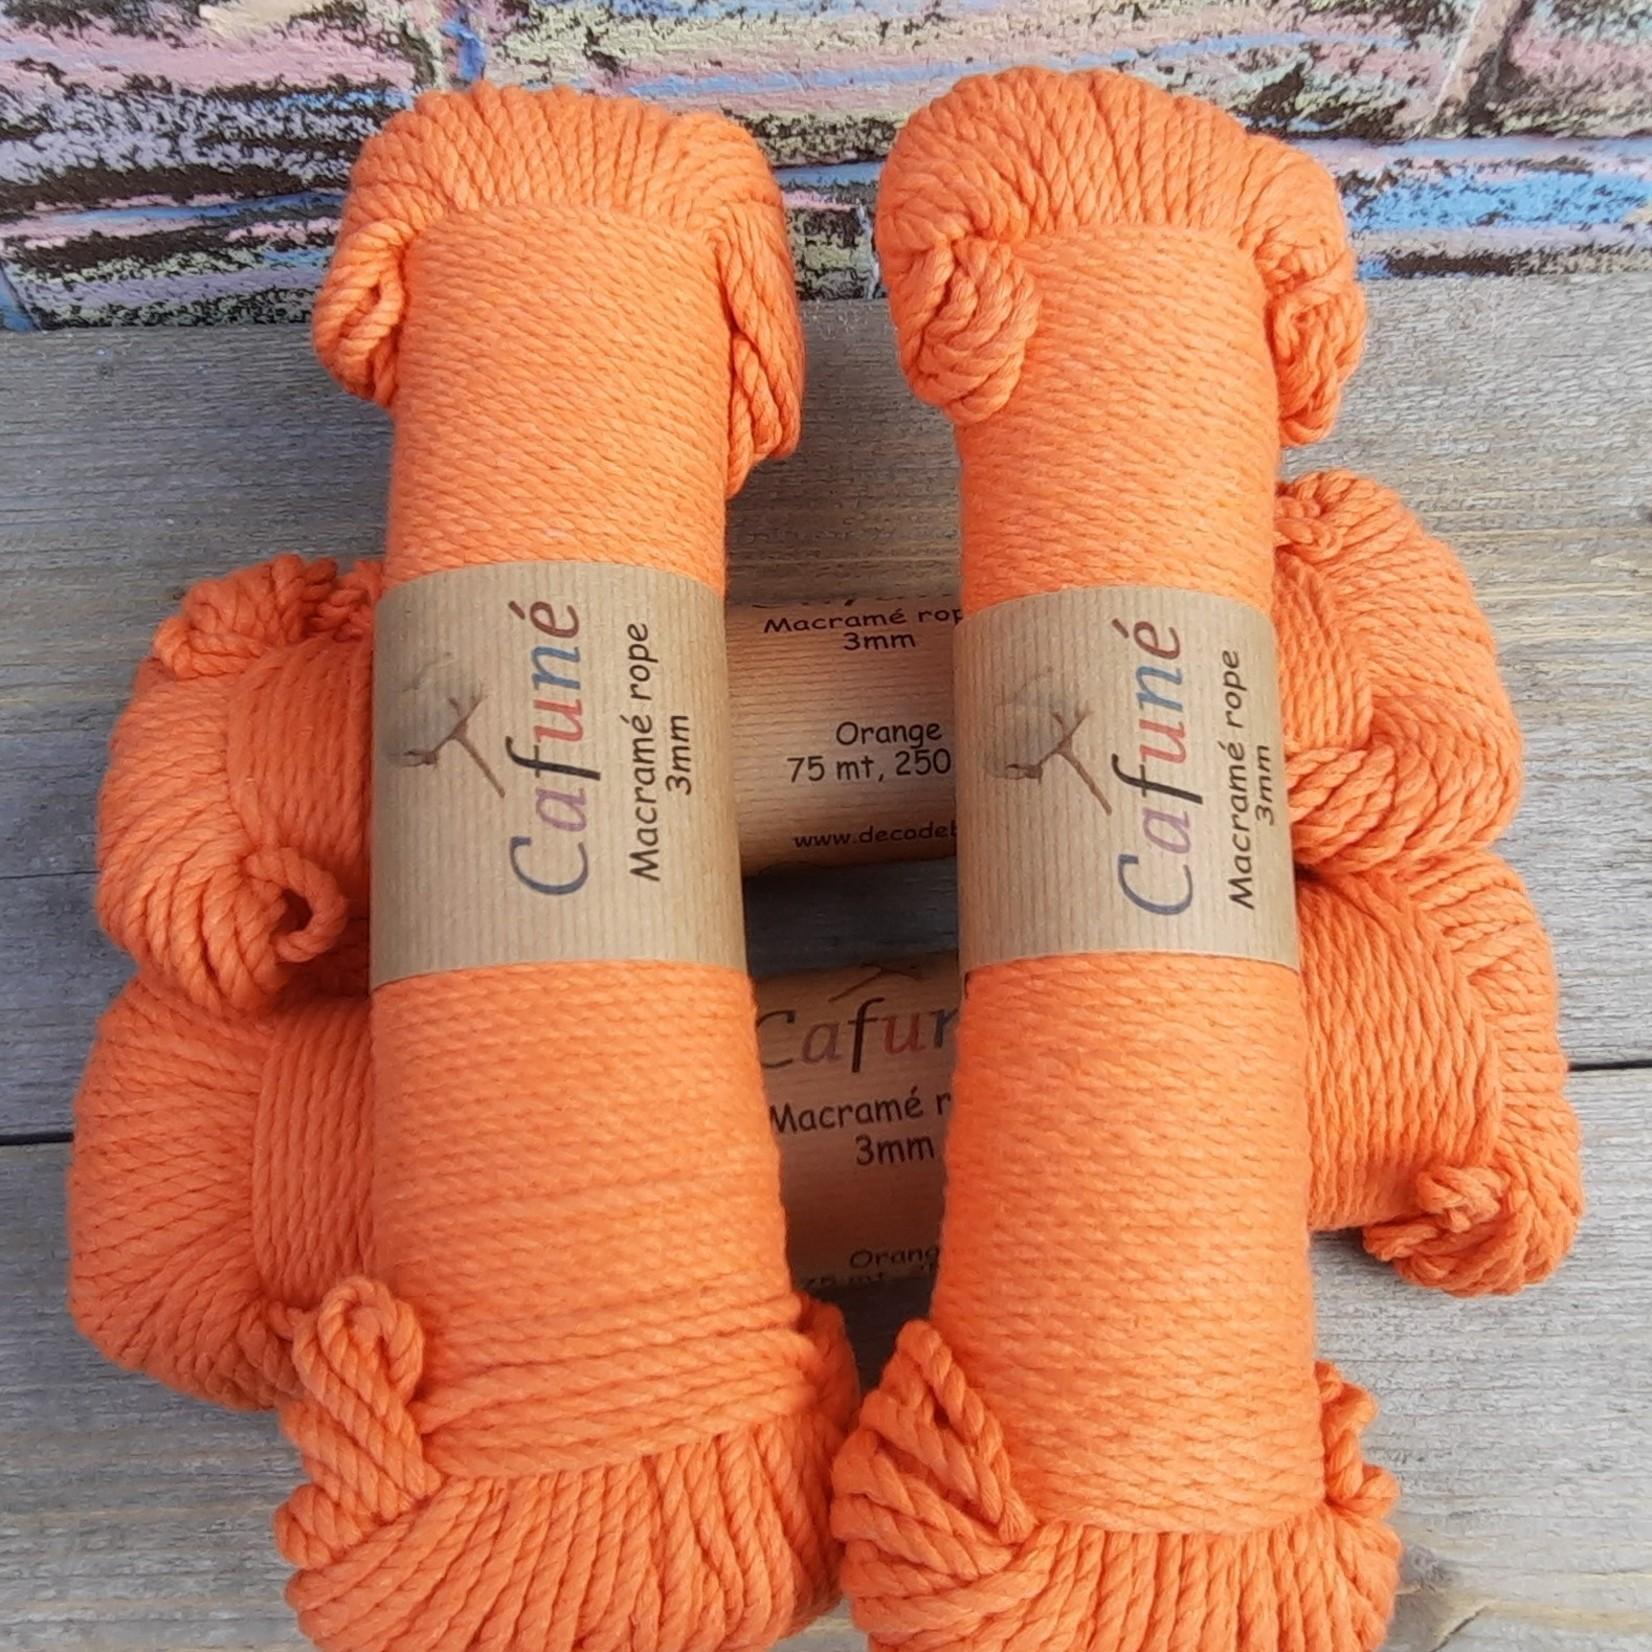 3mm Macrame touw Oranje, double twisted, uitkambaar